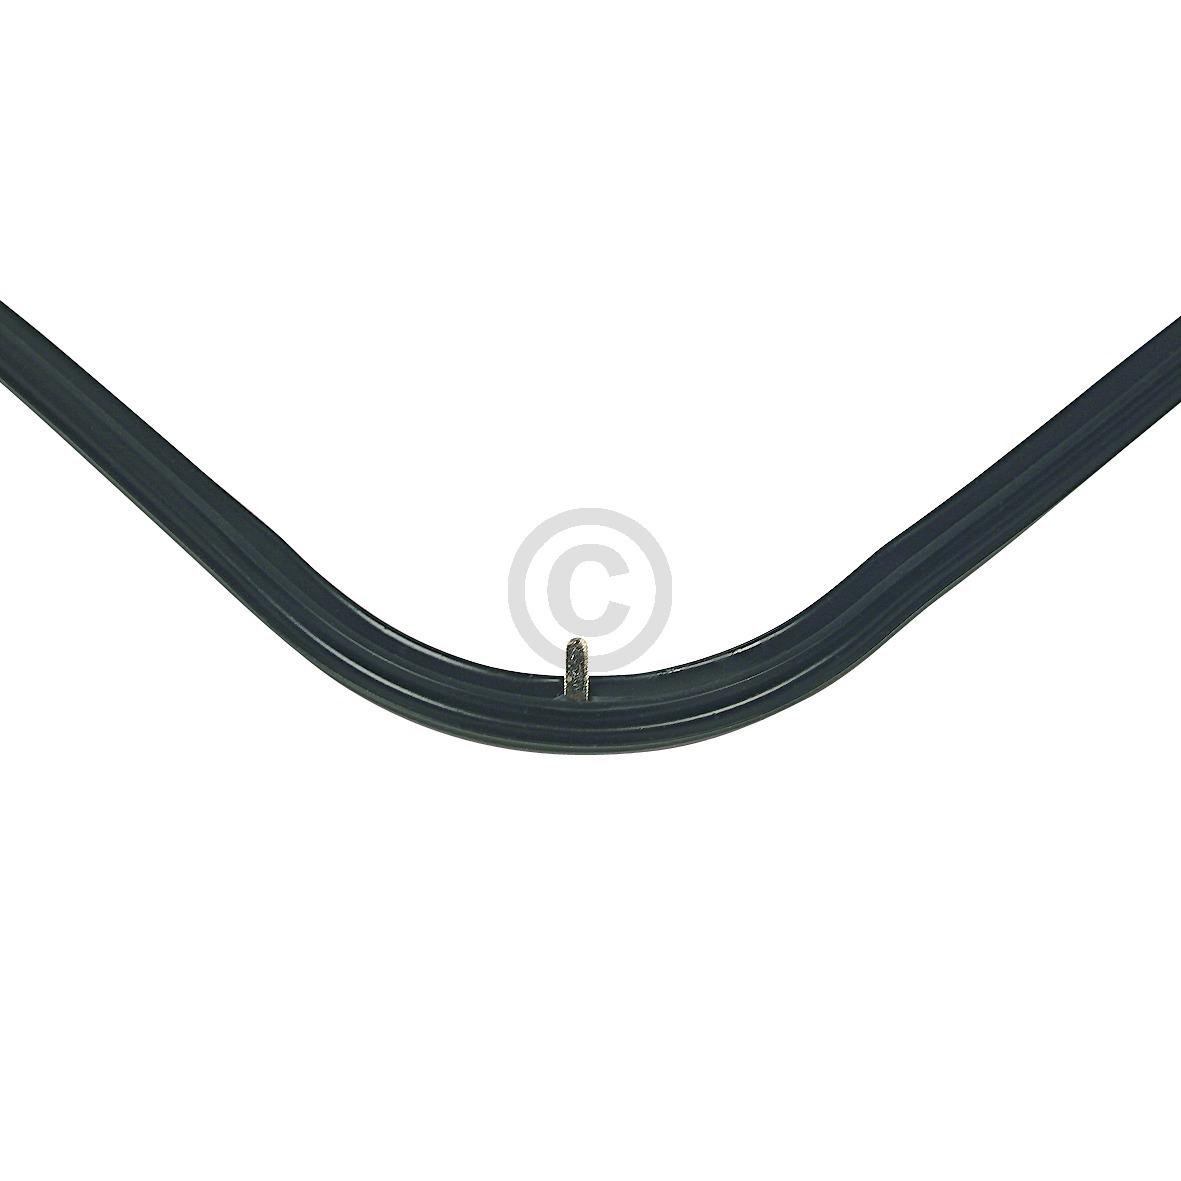 Türdichtung 4-seitig Zanussi 357725202/0 Alternative für Backofen AEG, Electrolu